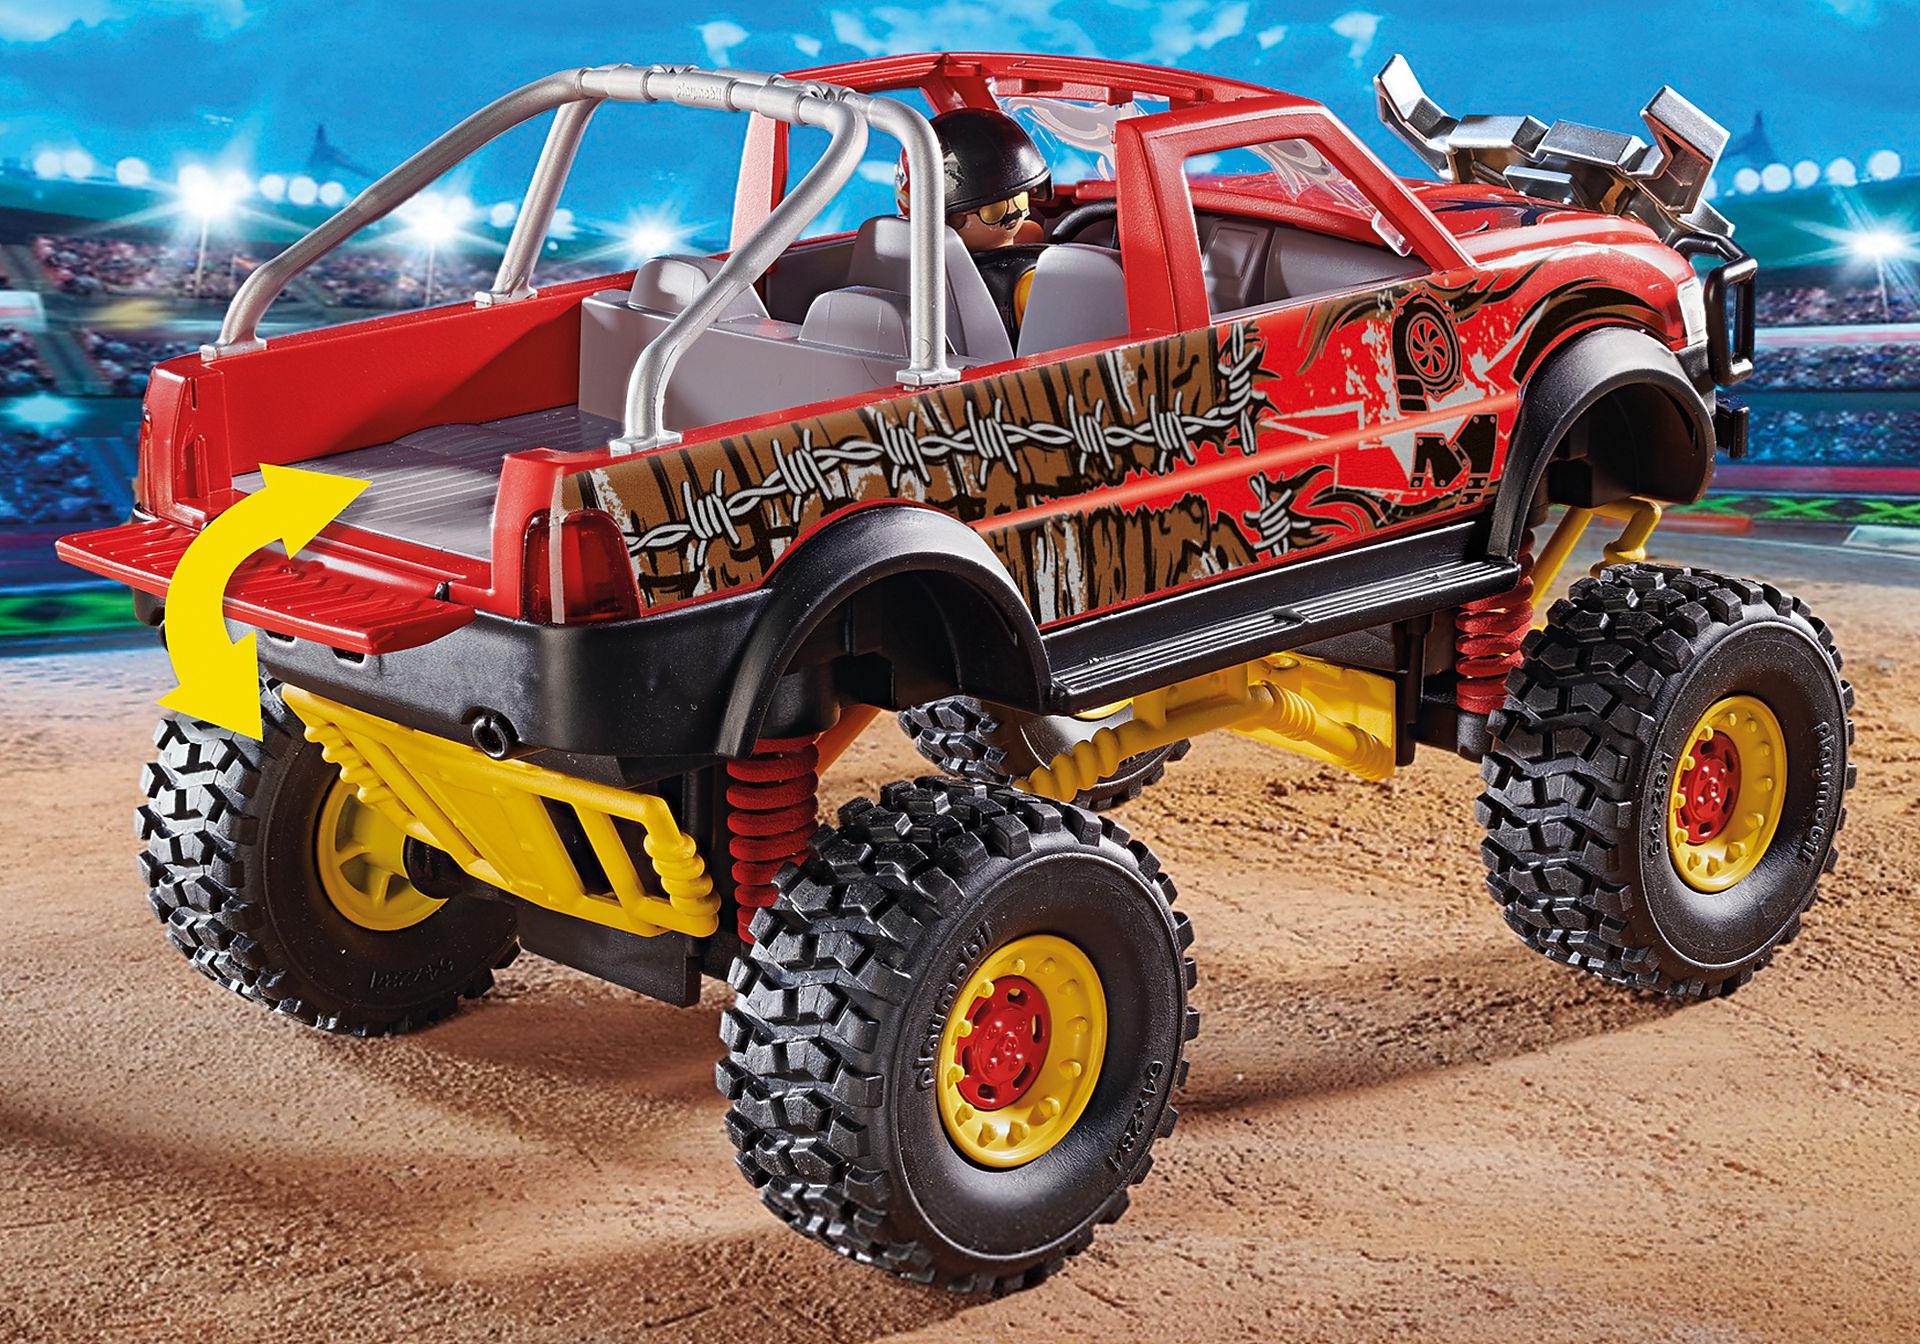 70549 Pokaz kaskaderski: Monster Truck Rogacz zoom image5